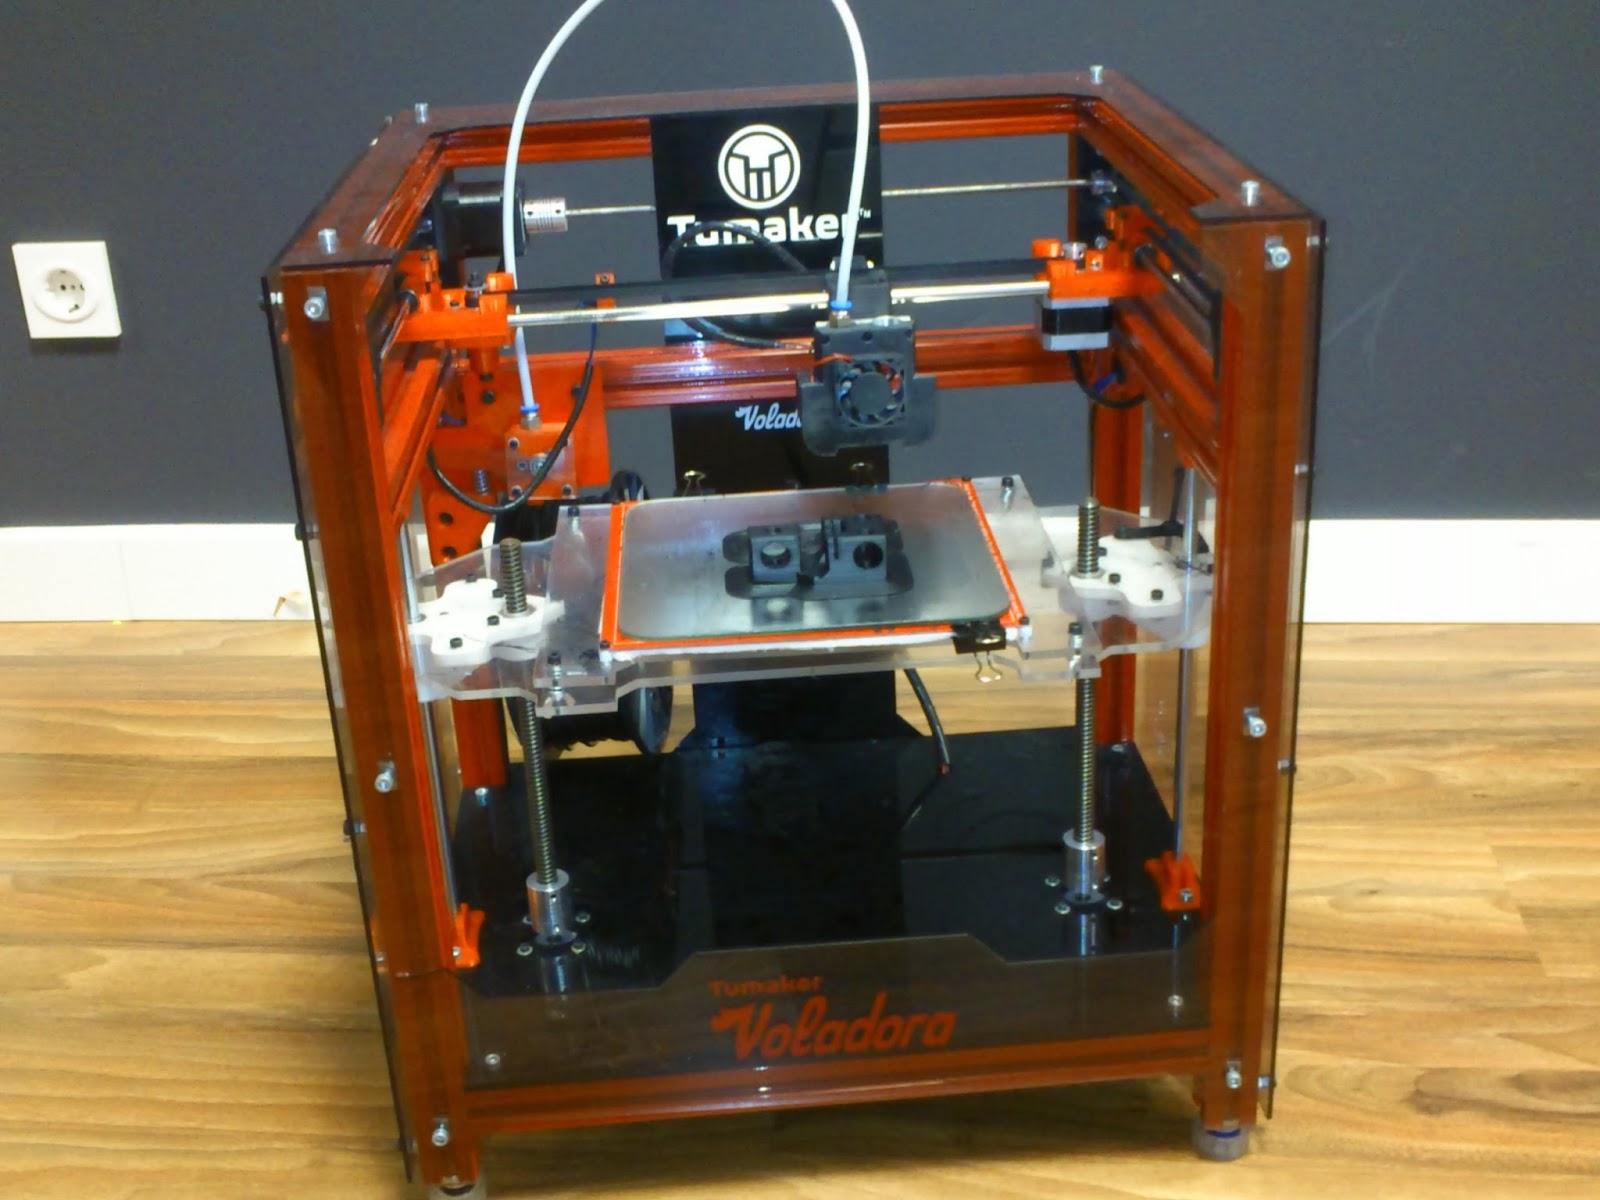 Voladora 3d Printer List Robotics Prometheus Pcb Maker Automates Circuit Board Creation Video